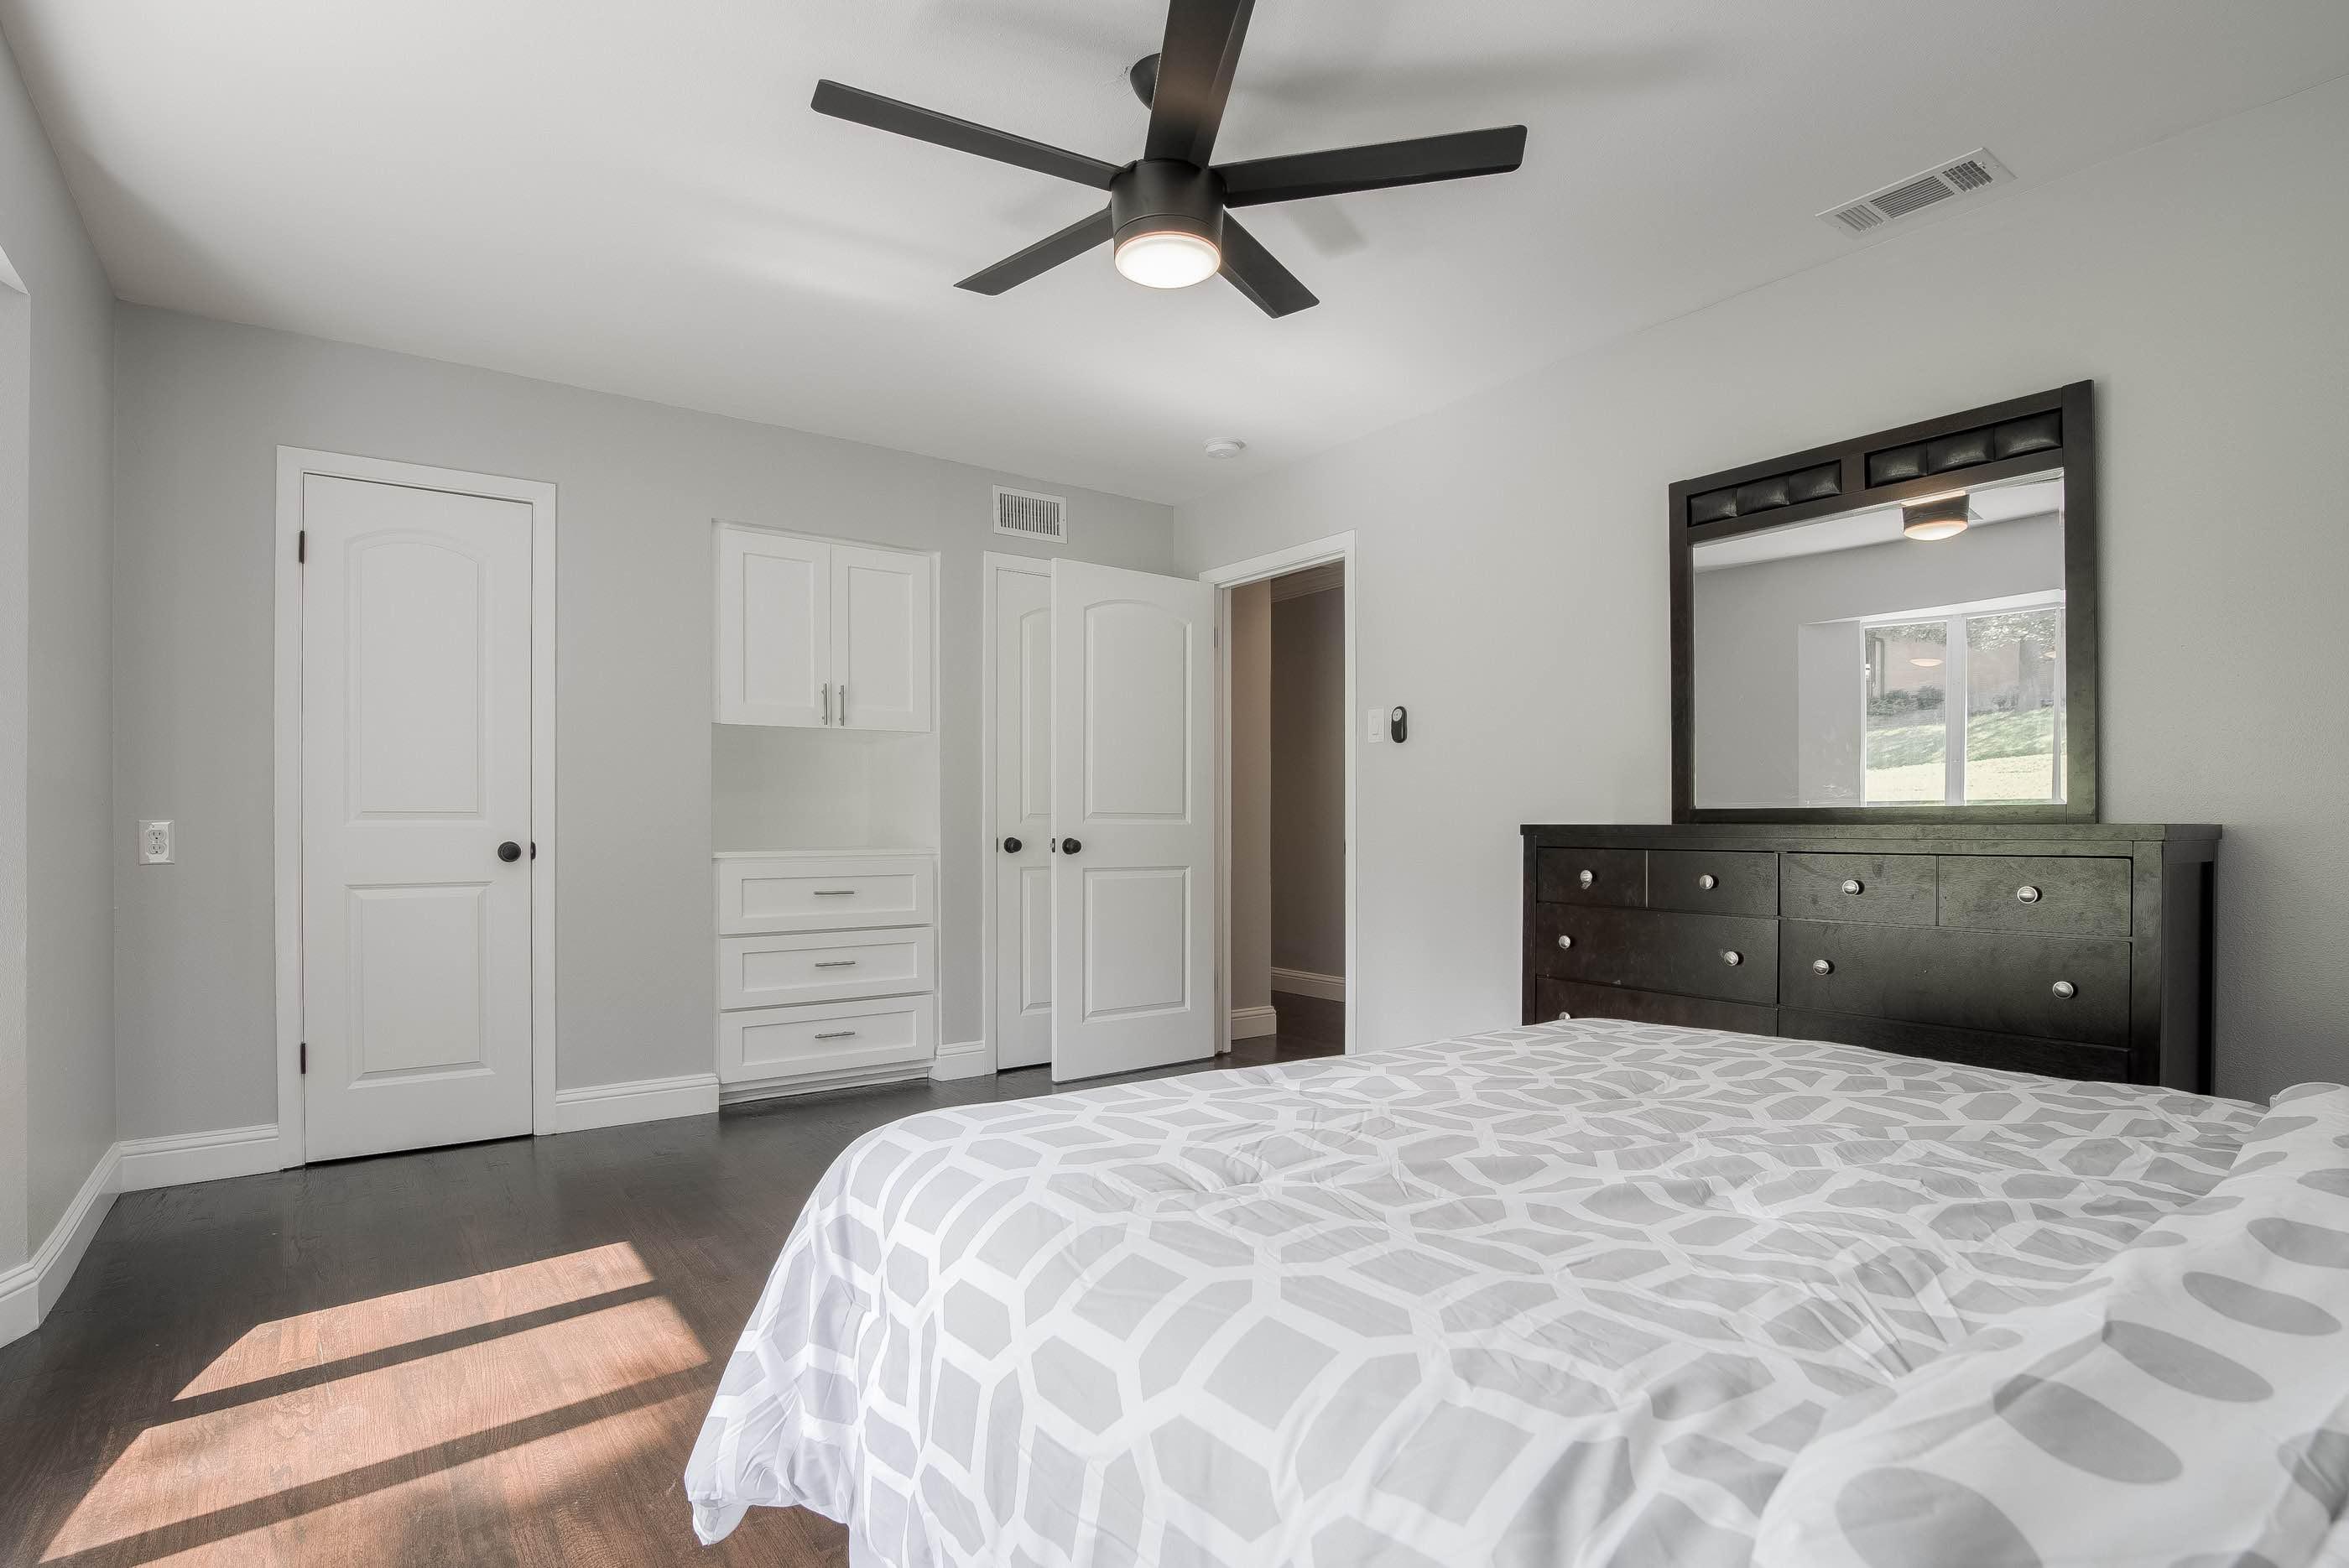 24 - bedroom dresser.jpg